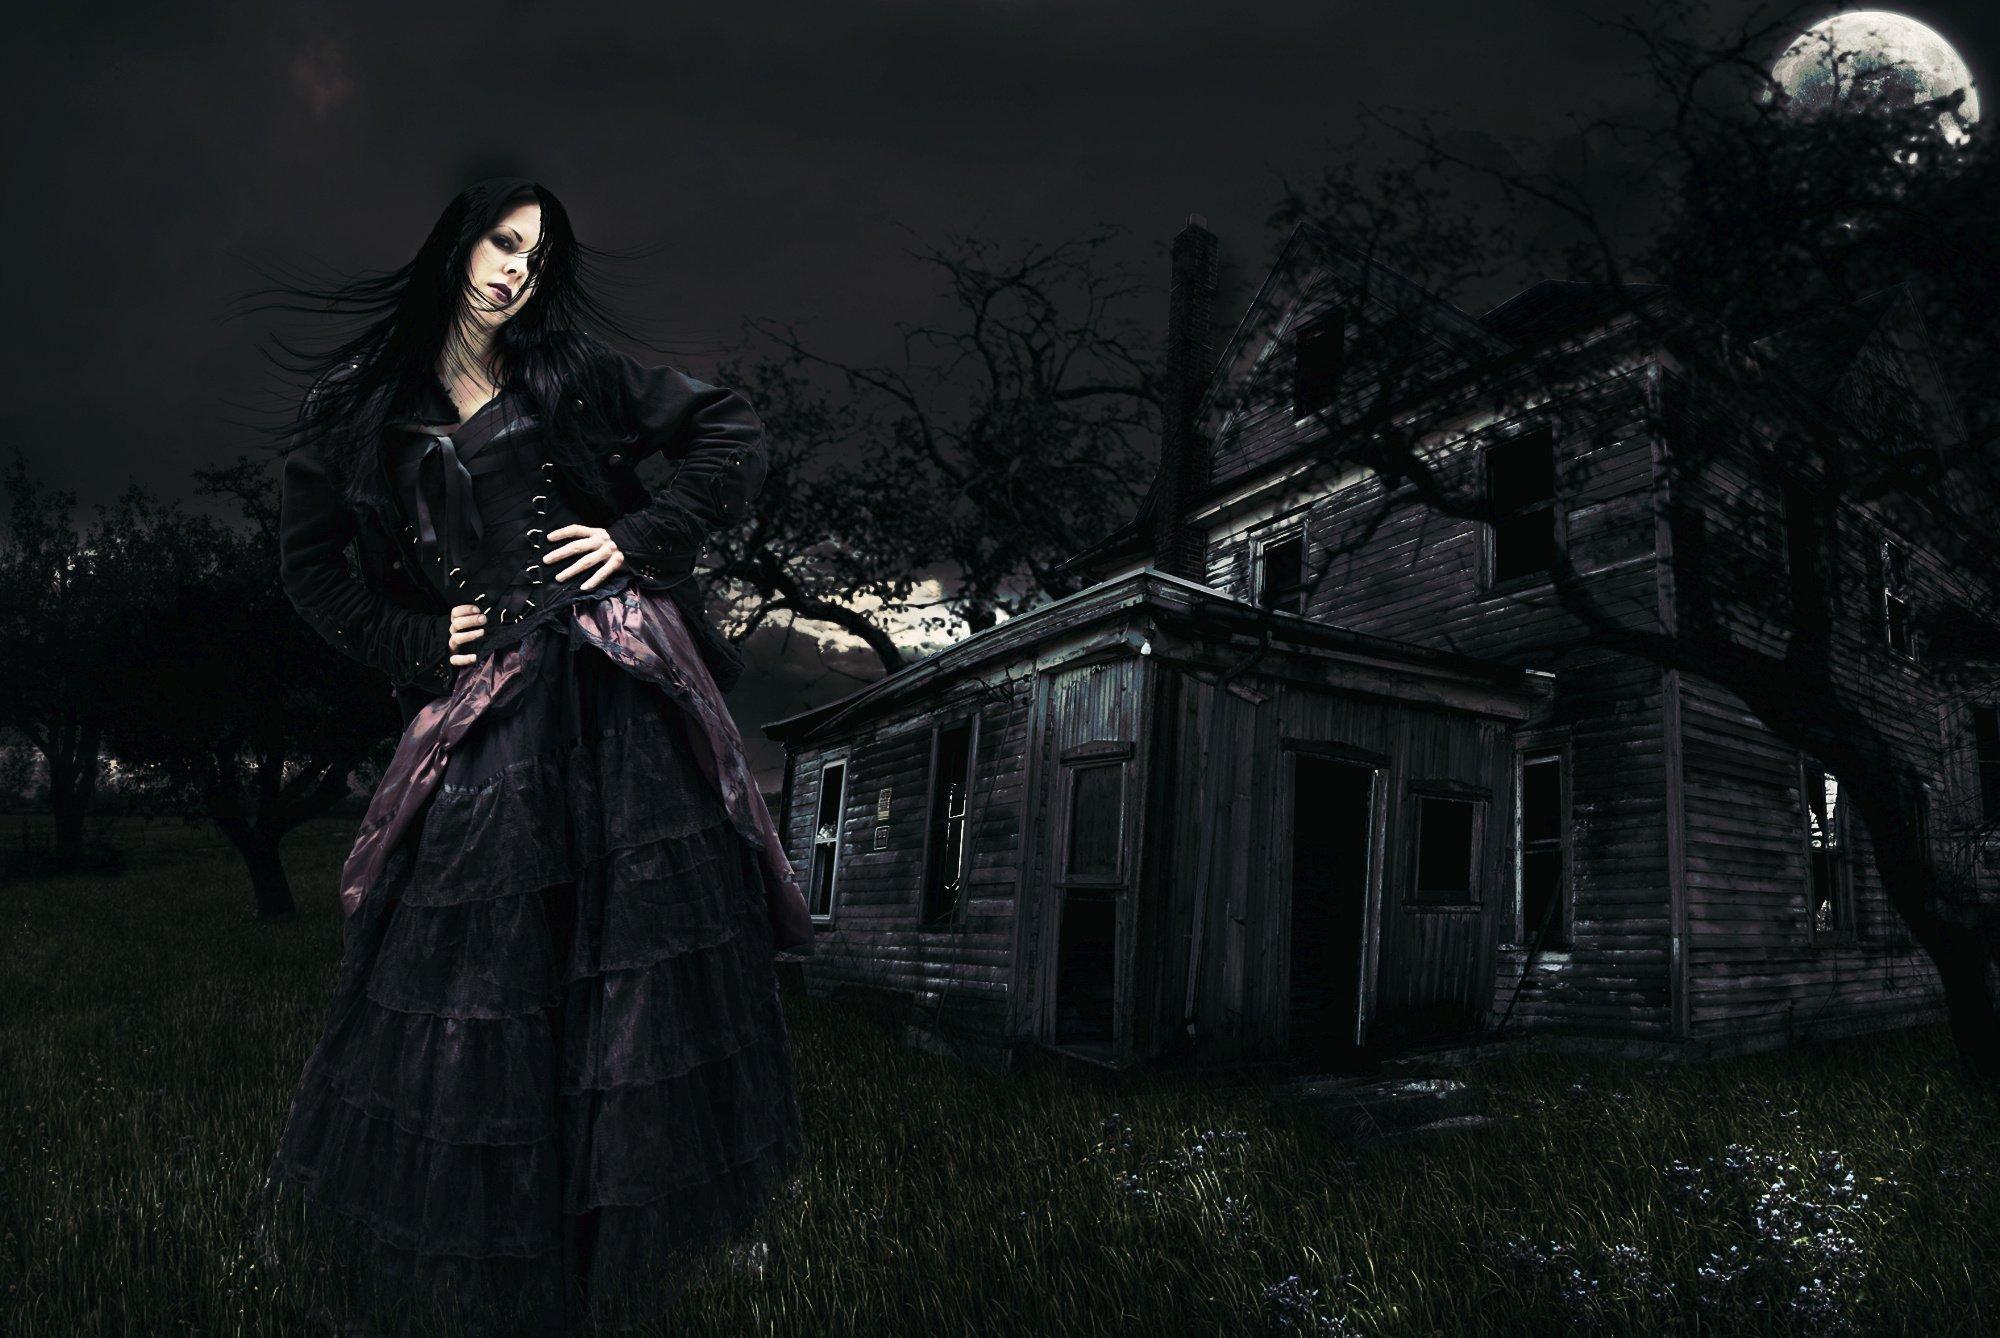 Wallpaper 2000x1338 Px Beautiful Dark Fantasy Gothic